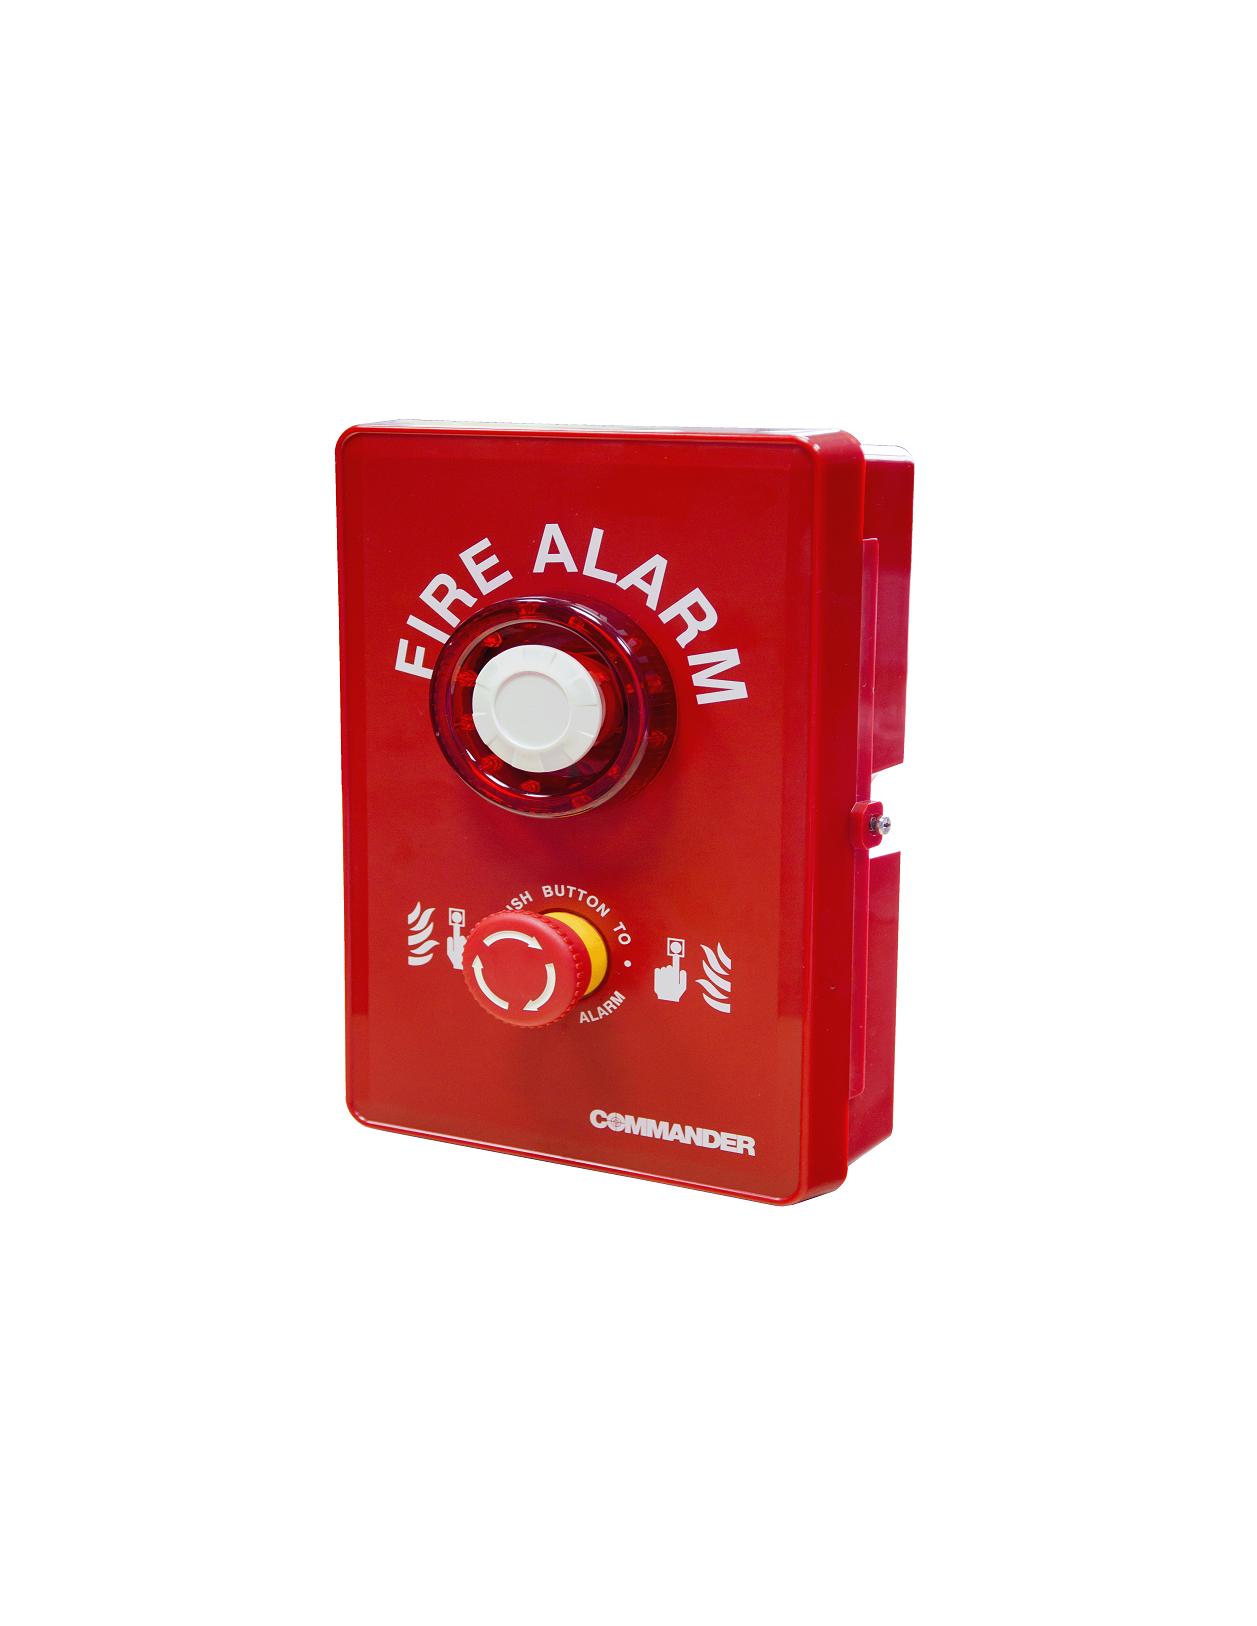 Fire Alarm Norfolk